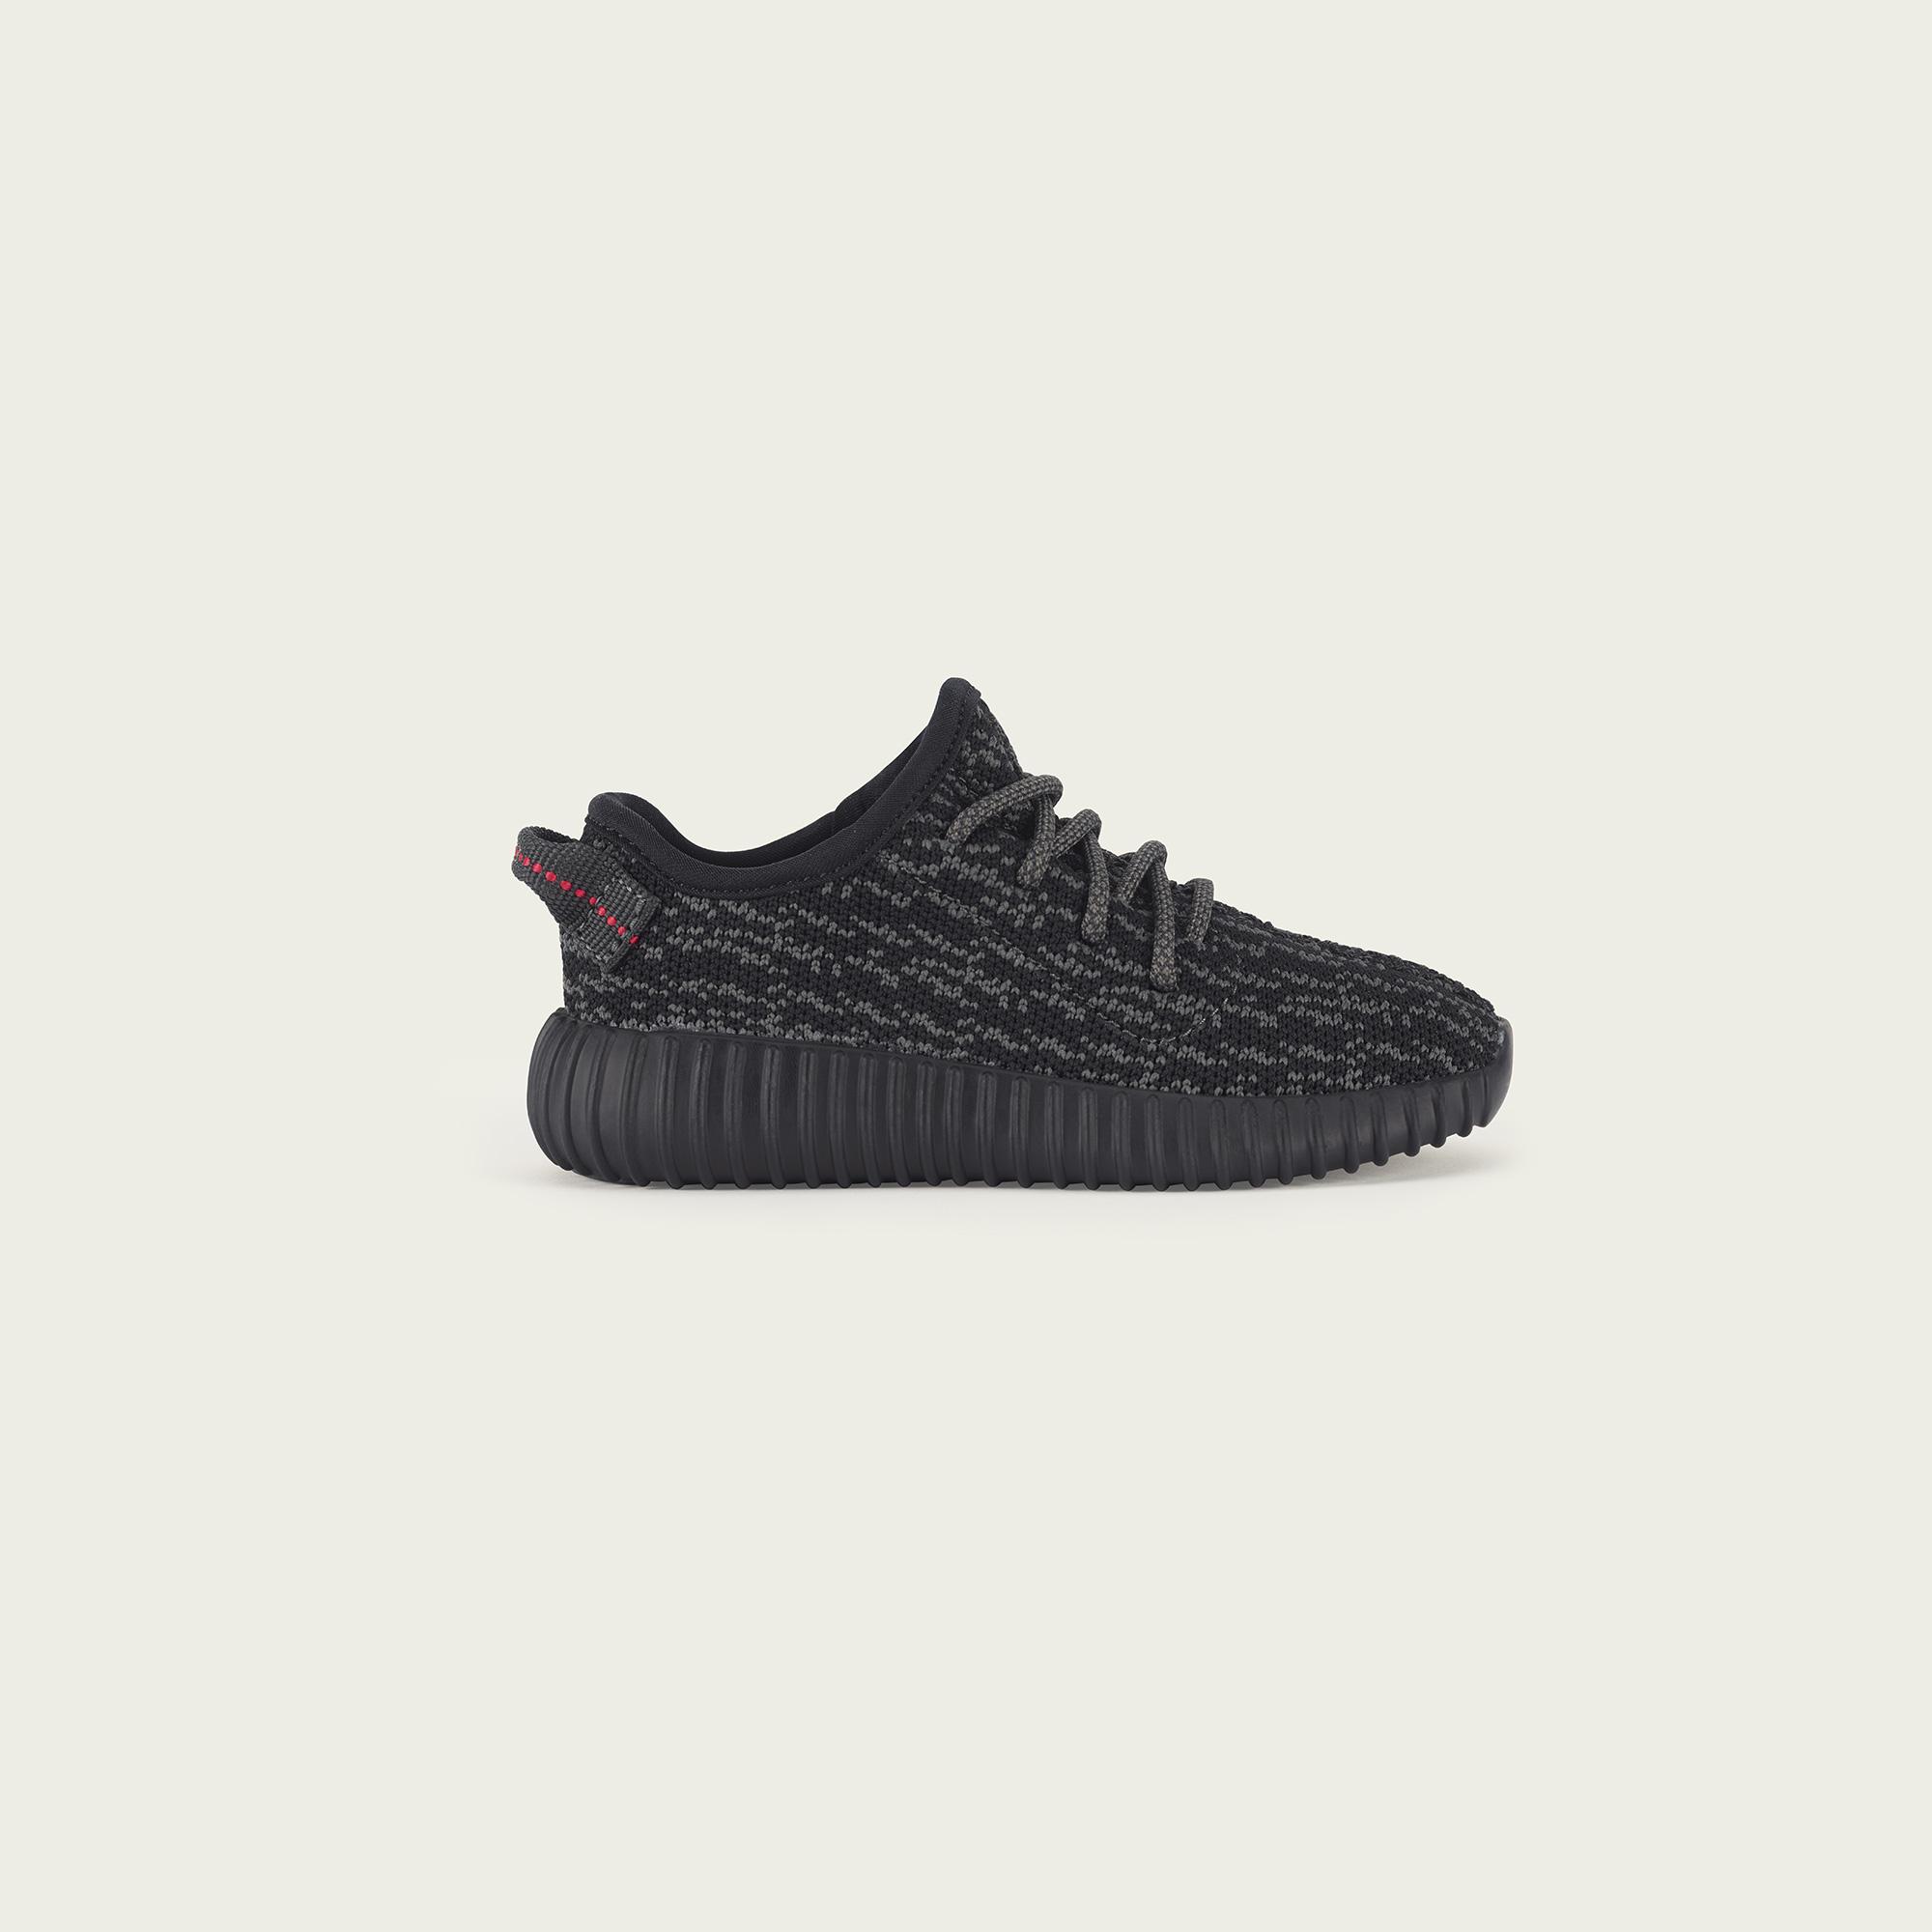 Adidas Yeezy 350 Infant